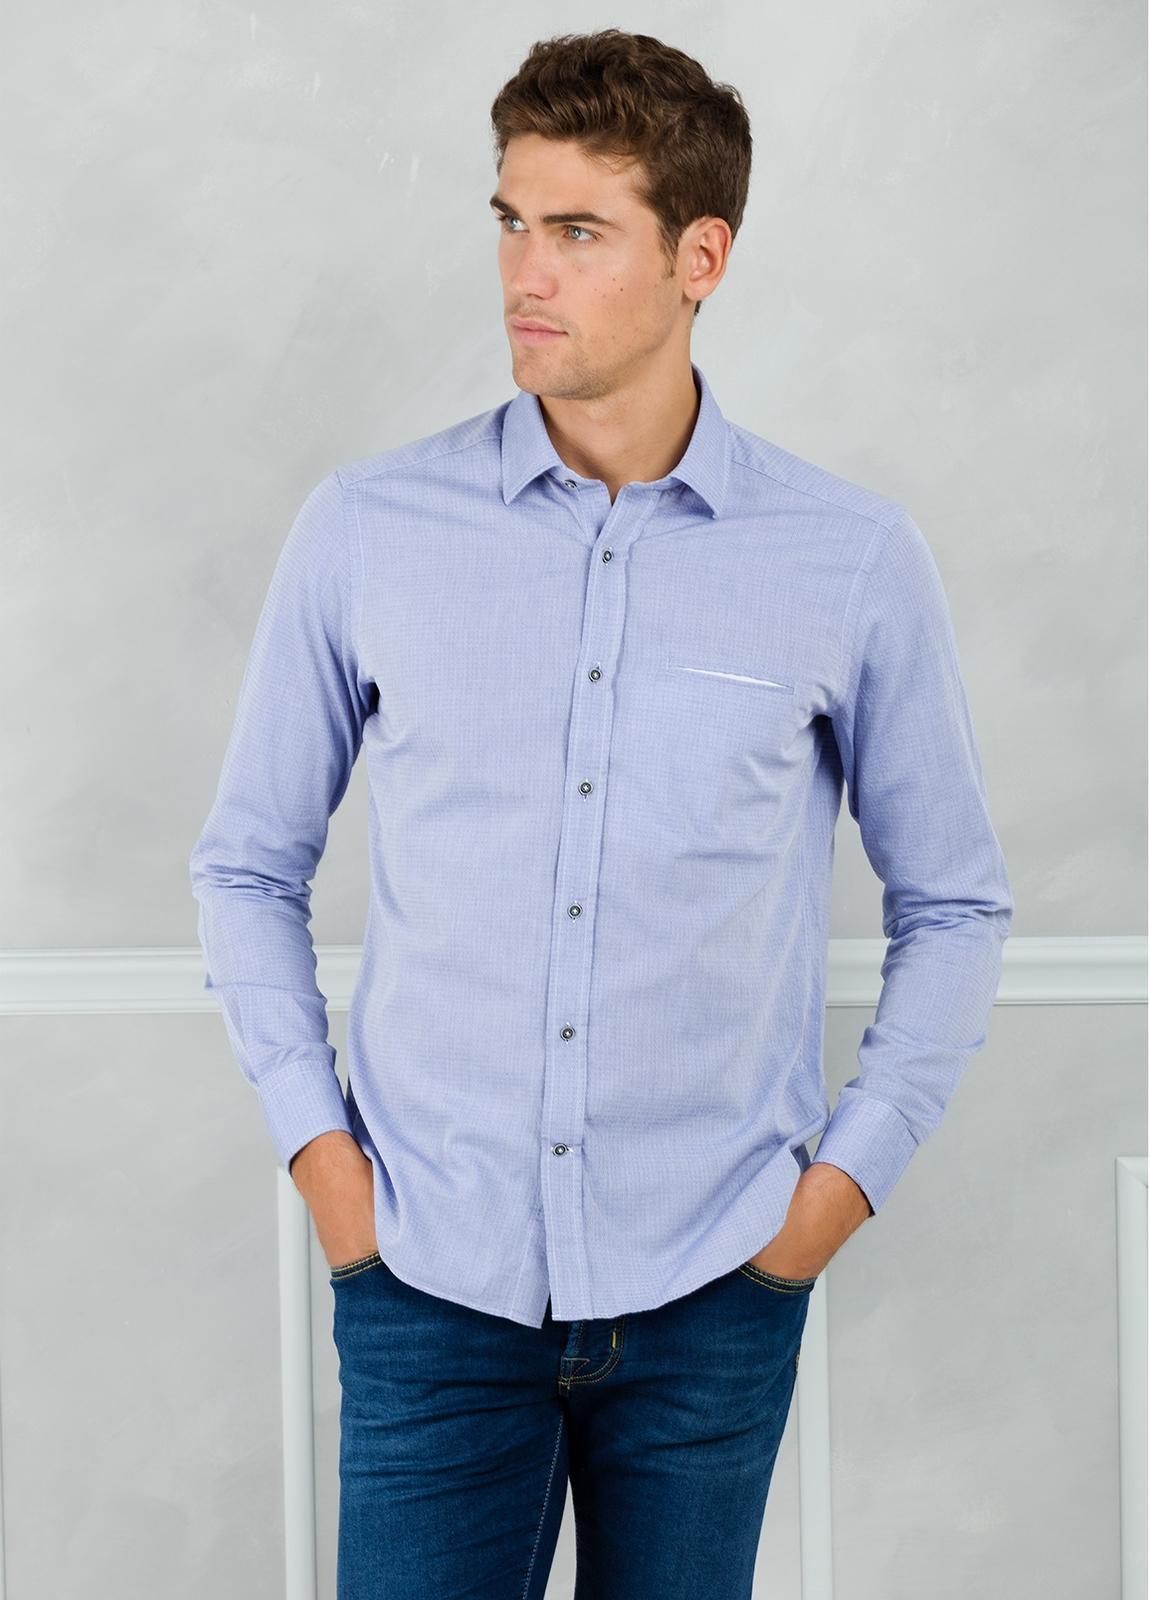 Camisa Leisure Wear REGULAR FIT modelo PORTO microdibujo color azul. 100% Algodón.